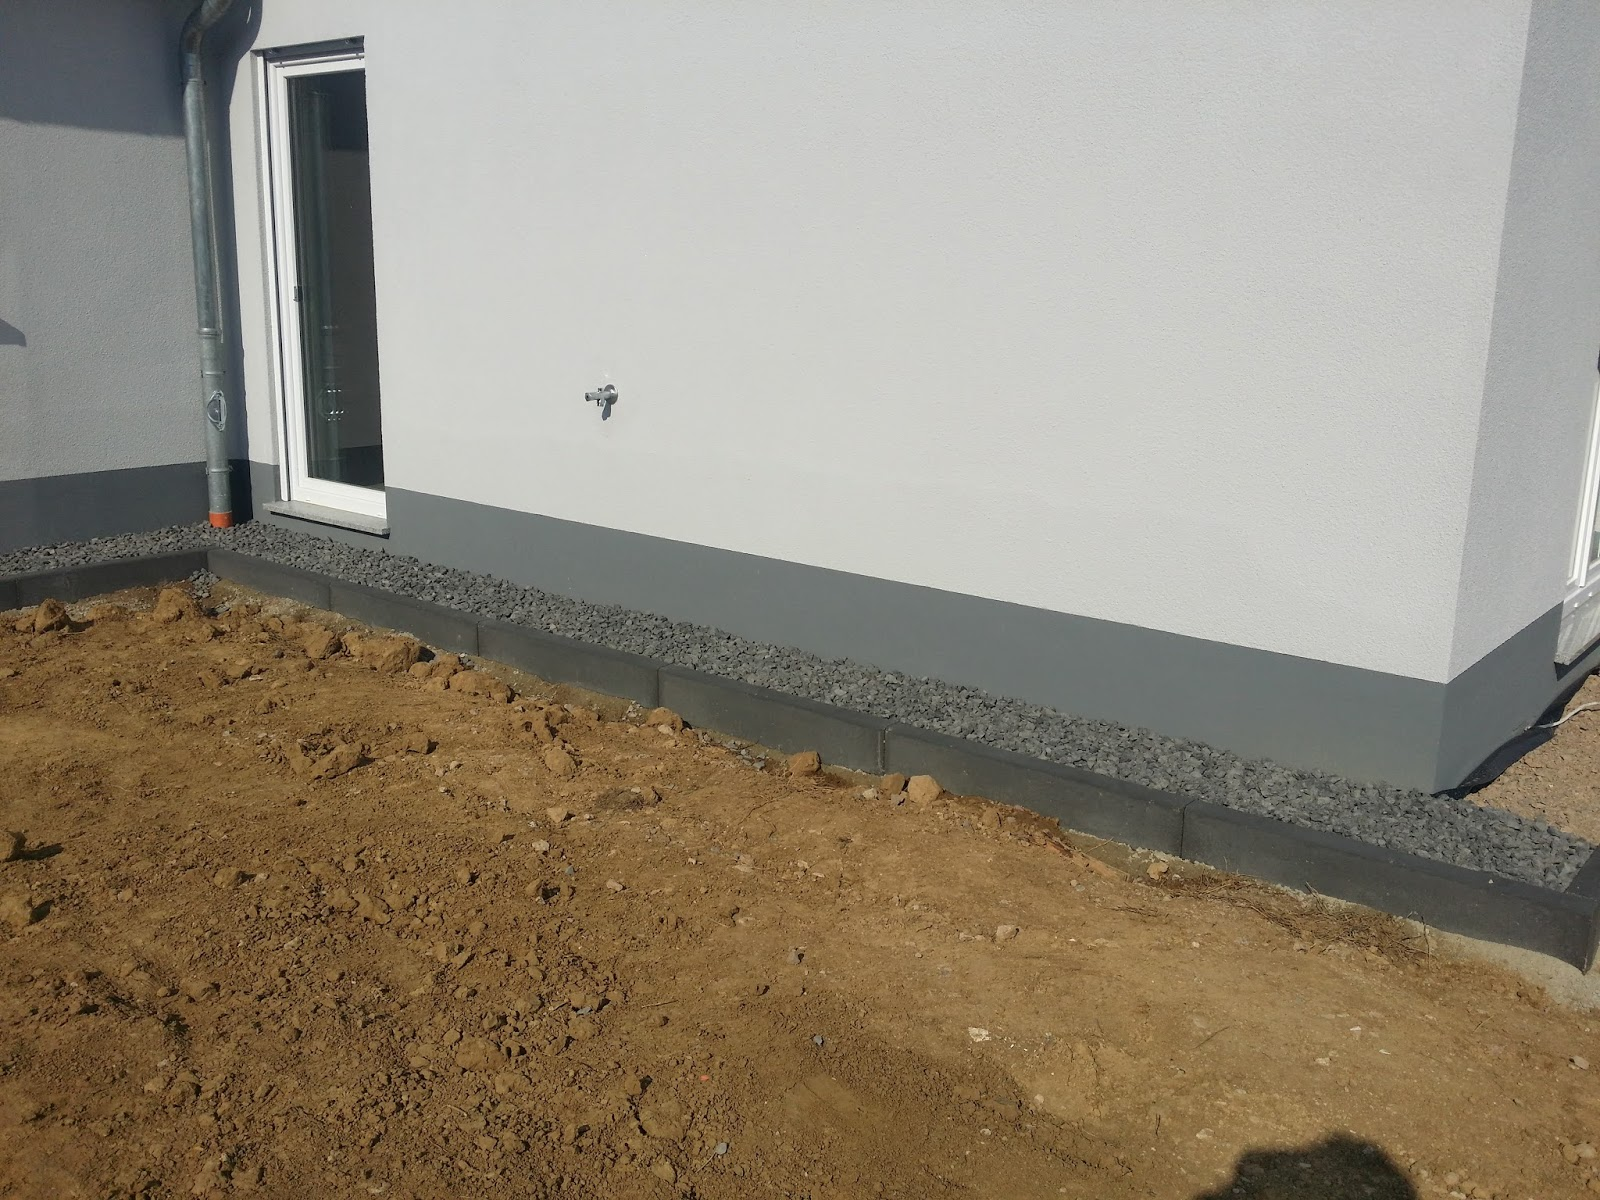 baublog wir bauen in neesbach juli 2015. Black Bedroom Furniture Sets. Home Design Ideas